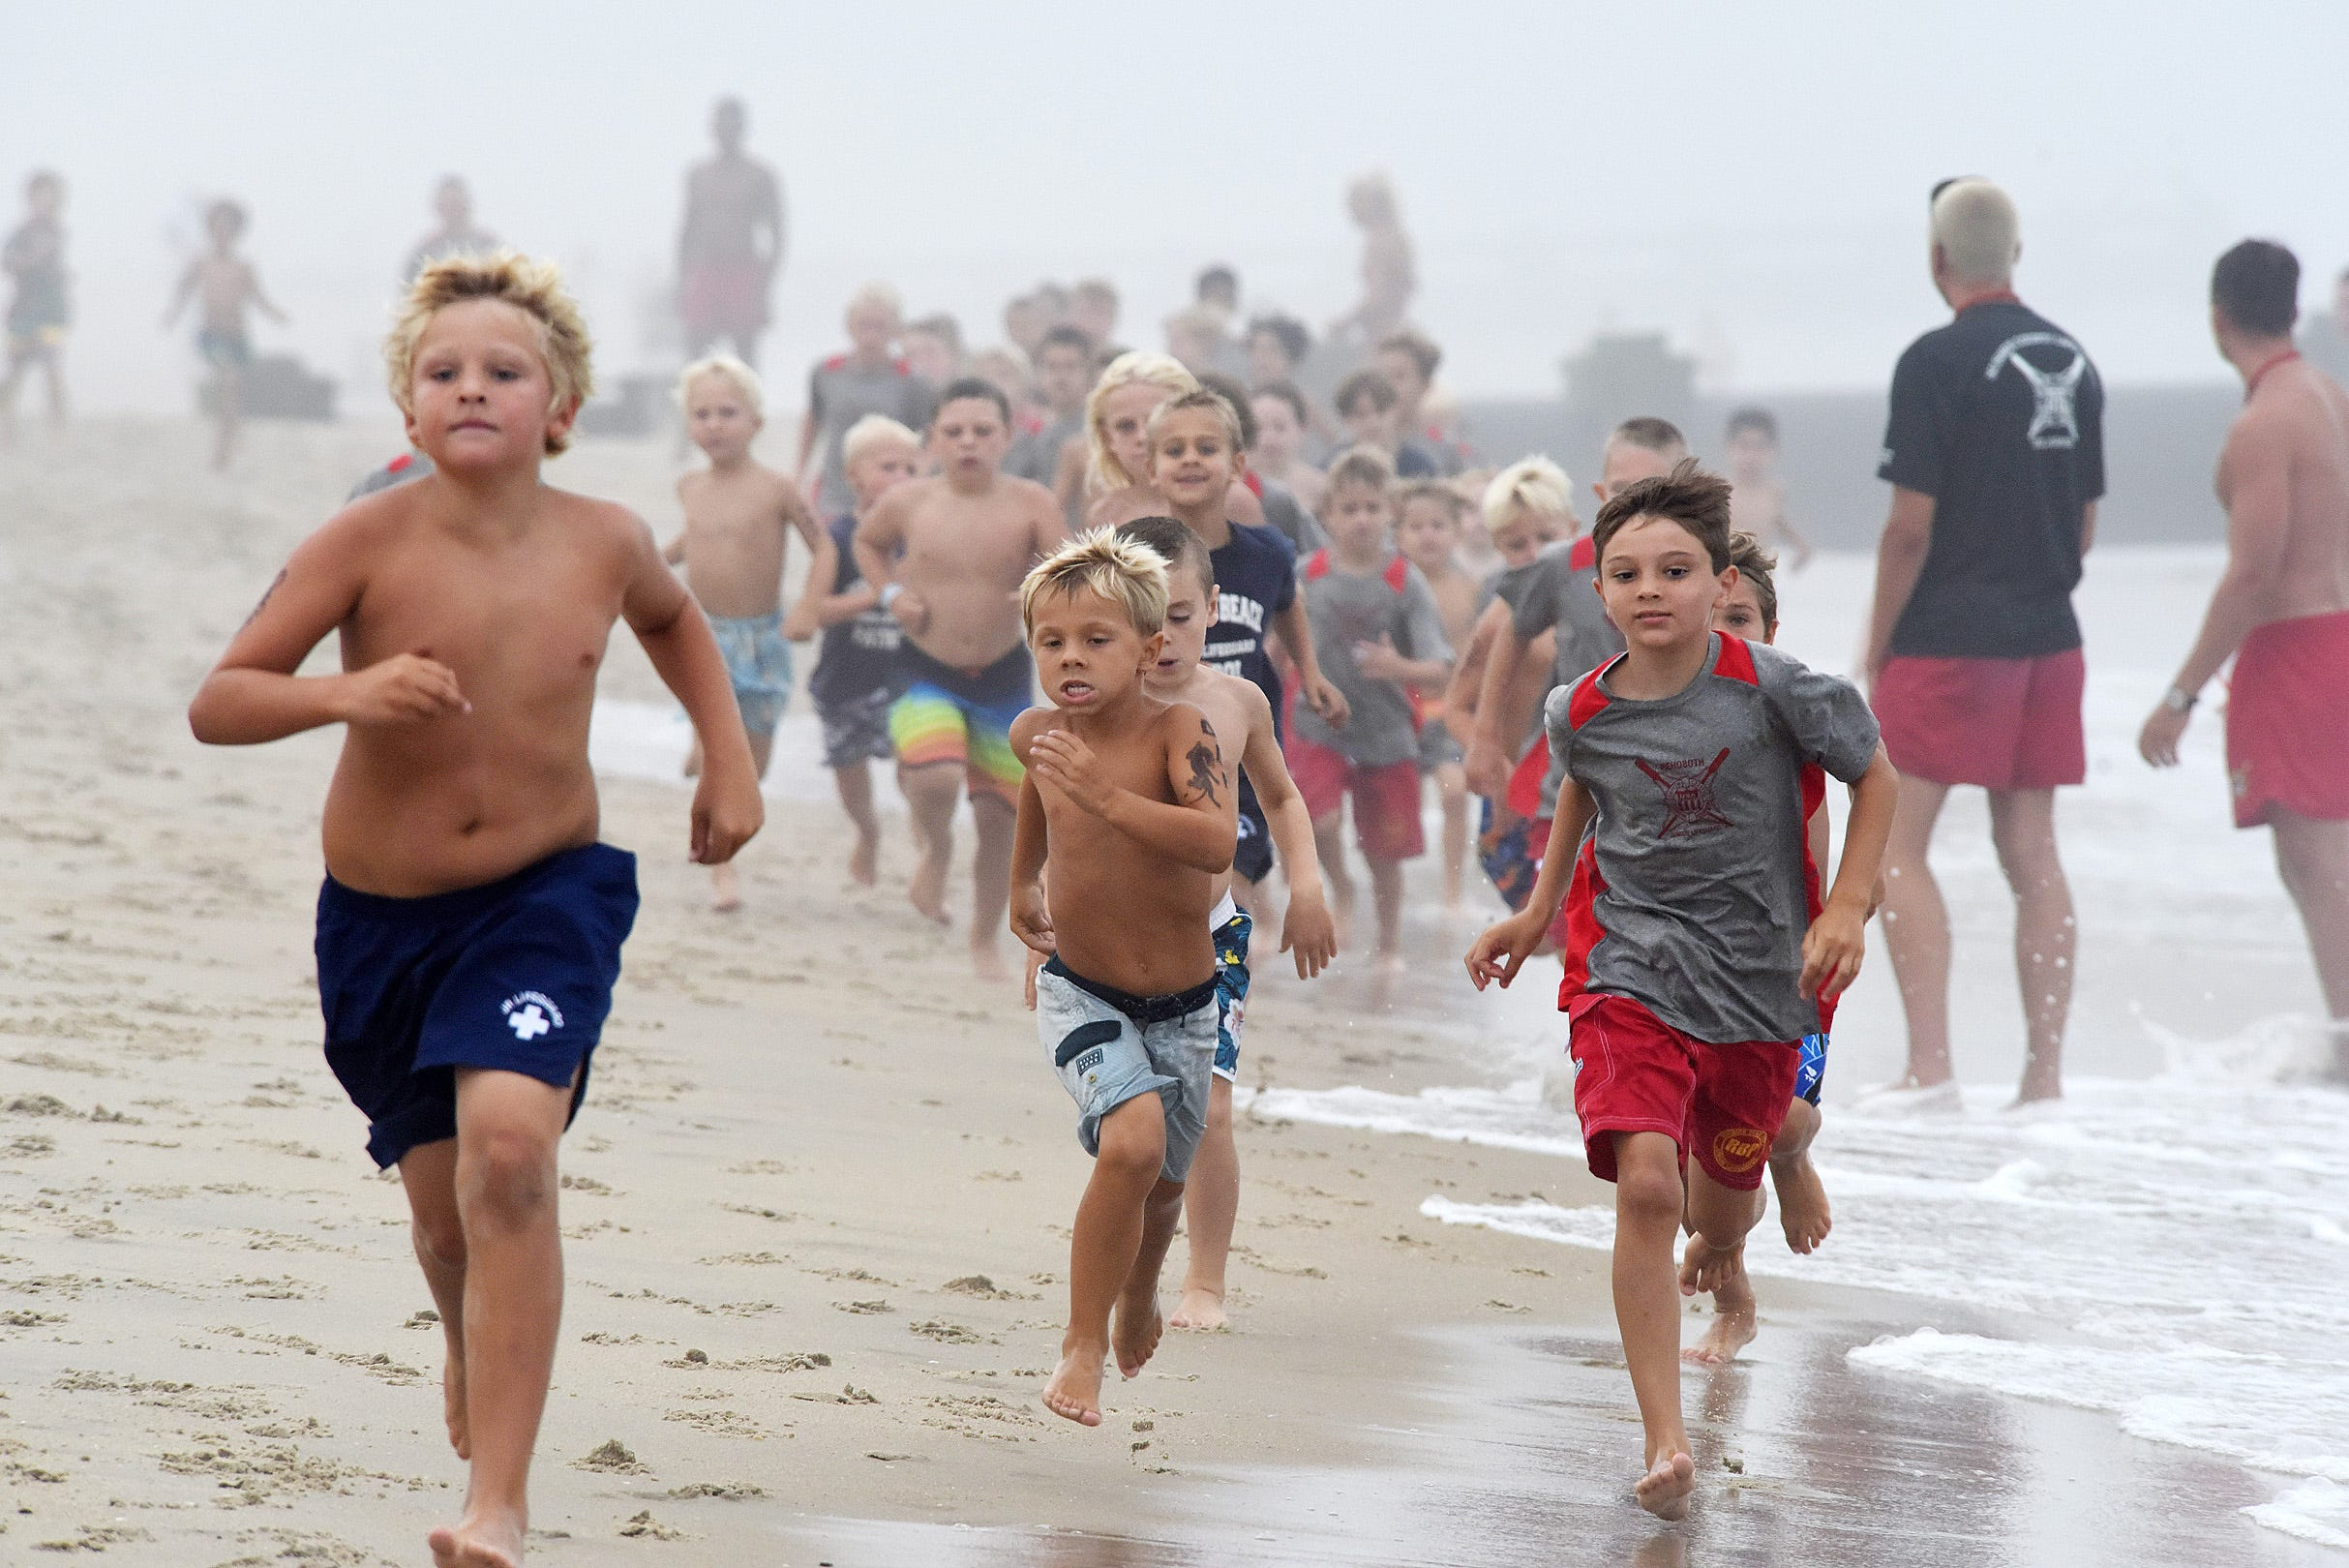 Suining Beauty Deer Sleeping Swim Beach Trunks Cargo Shorts For Mens